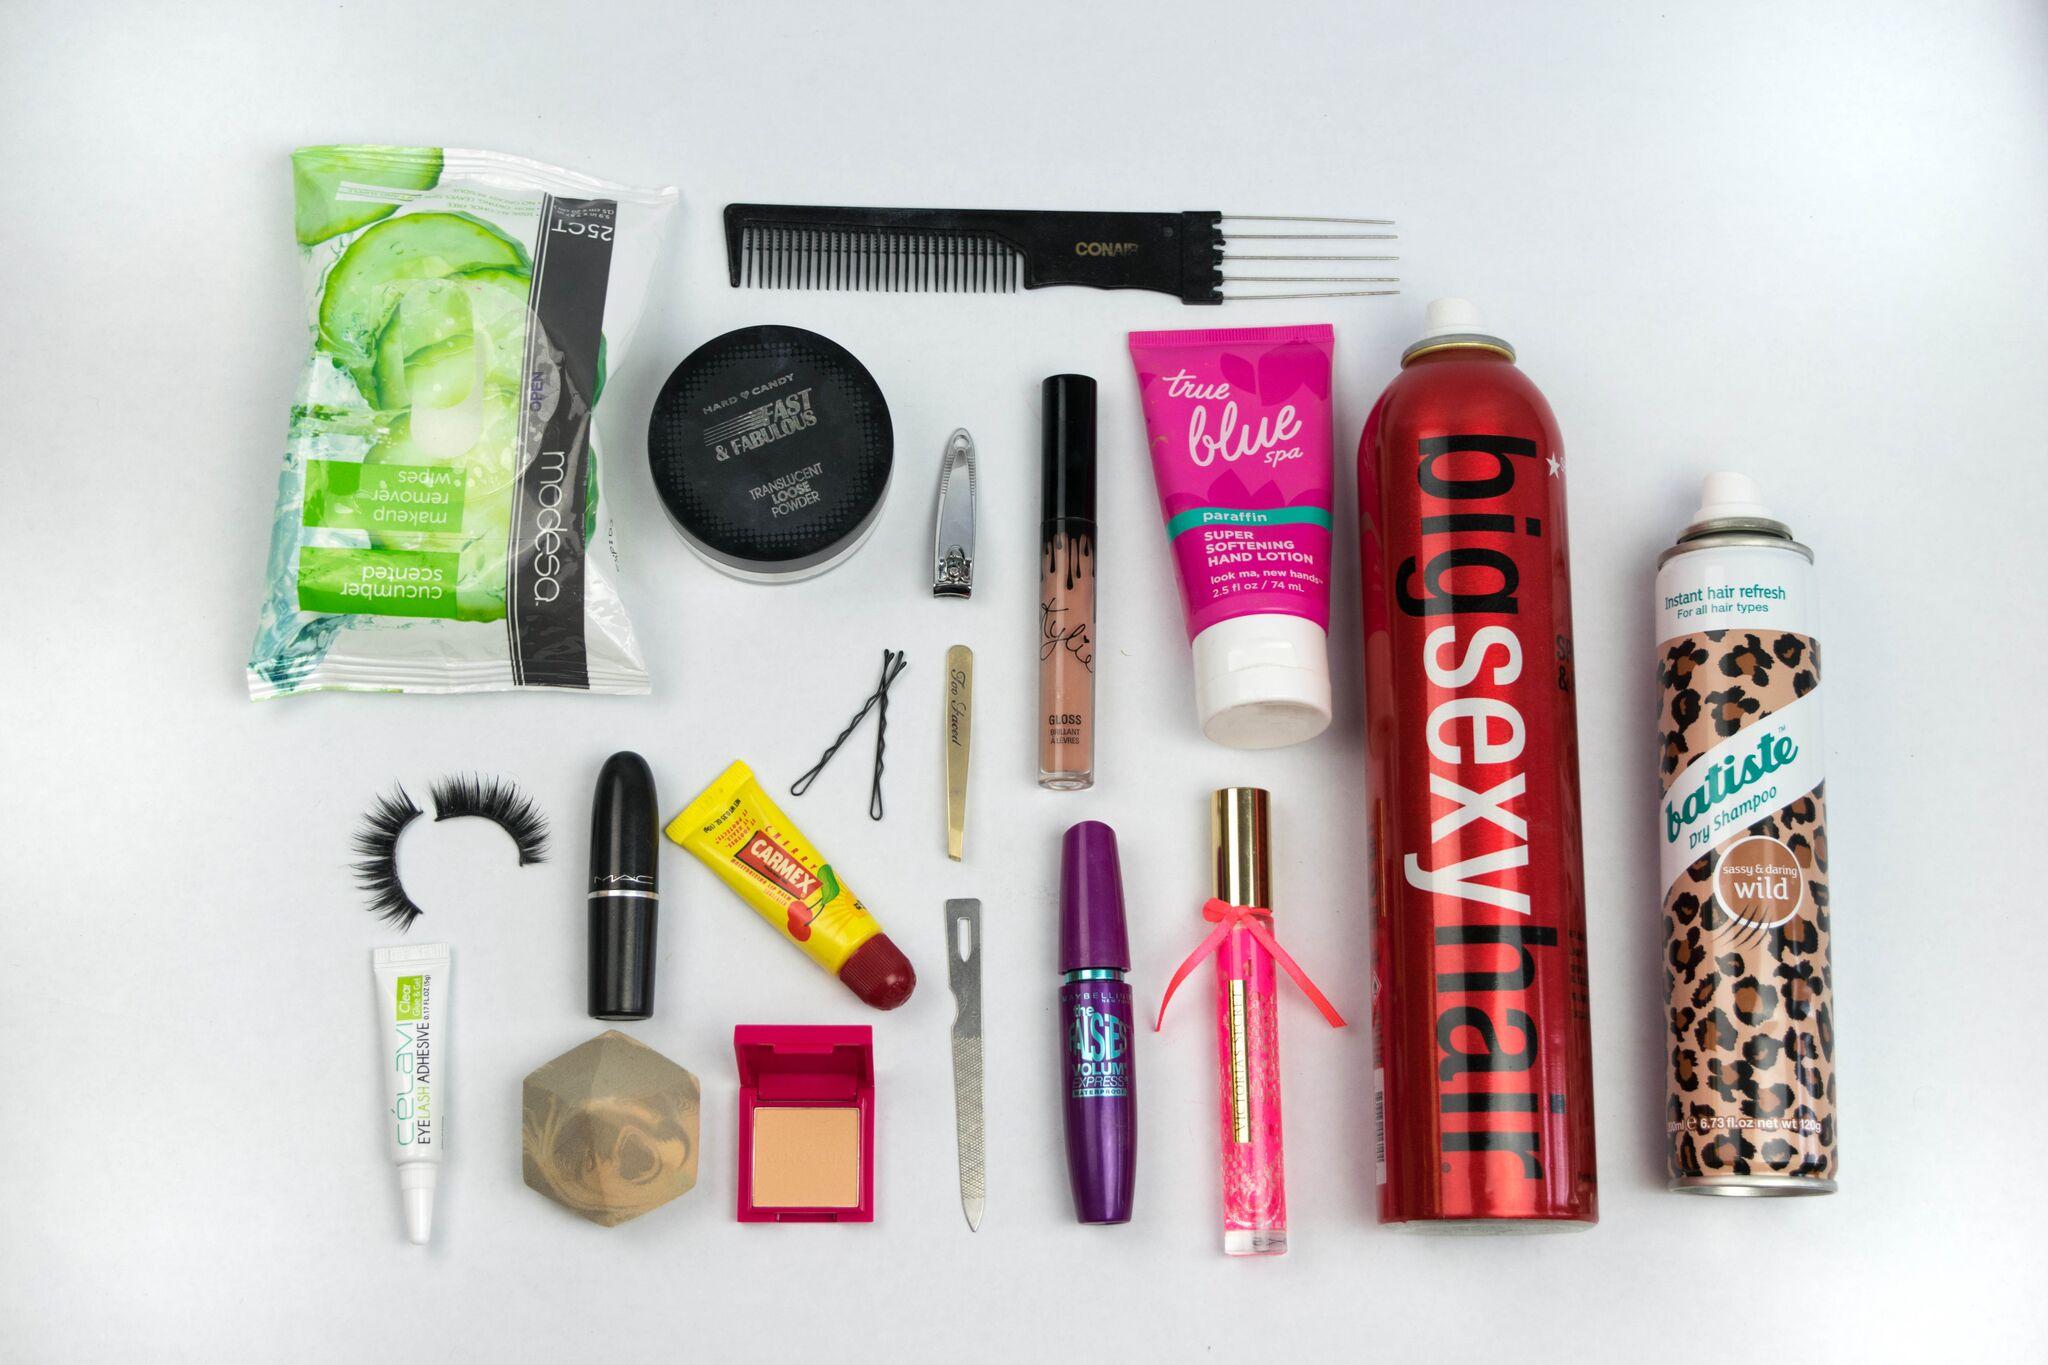 Bridal Beauty Emergency Kit - I DO Y'ALL